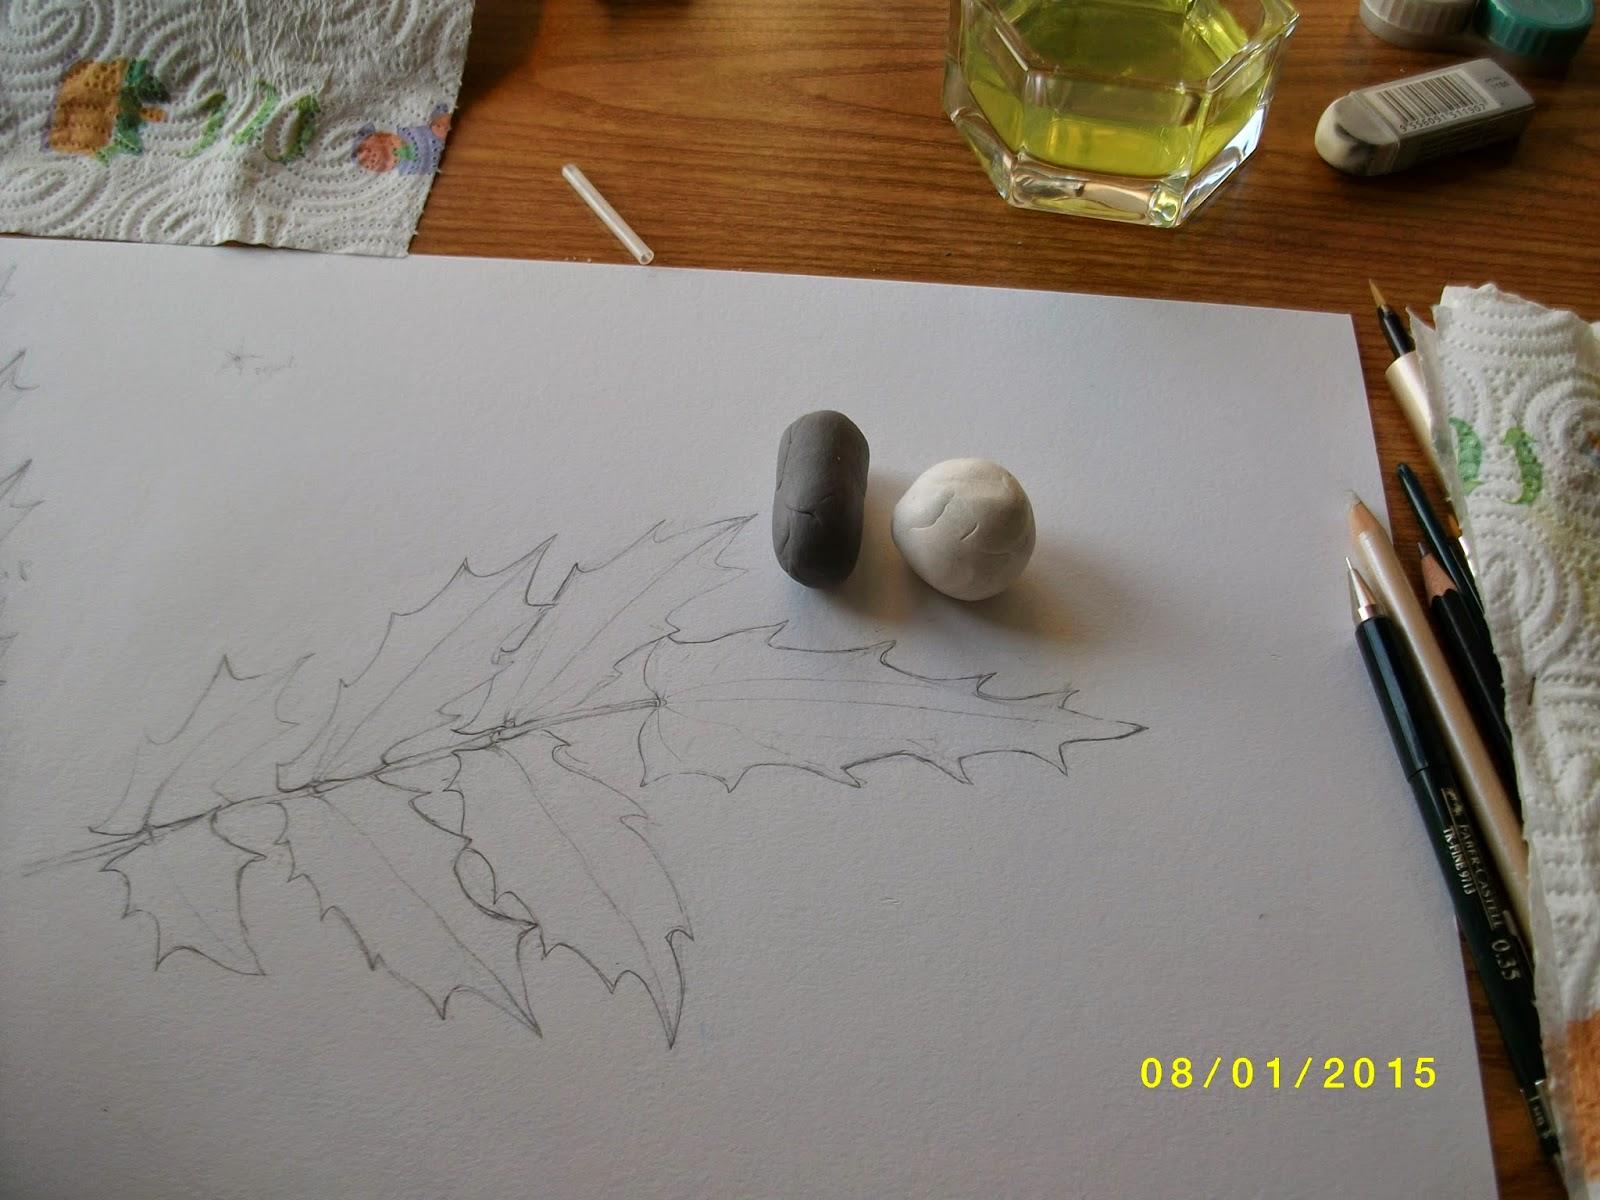 aperta-mentebotanicalart: gomma pane come utilizzarla